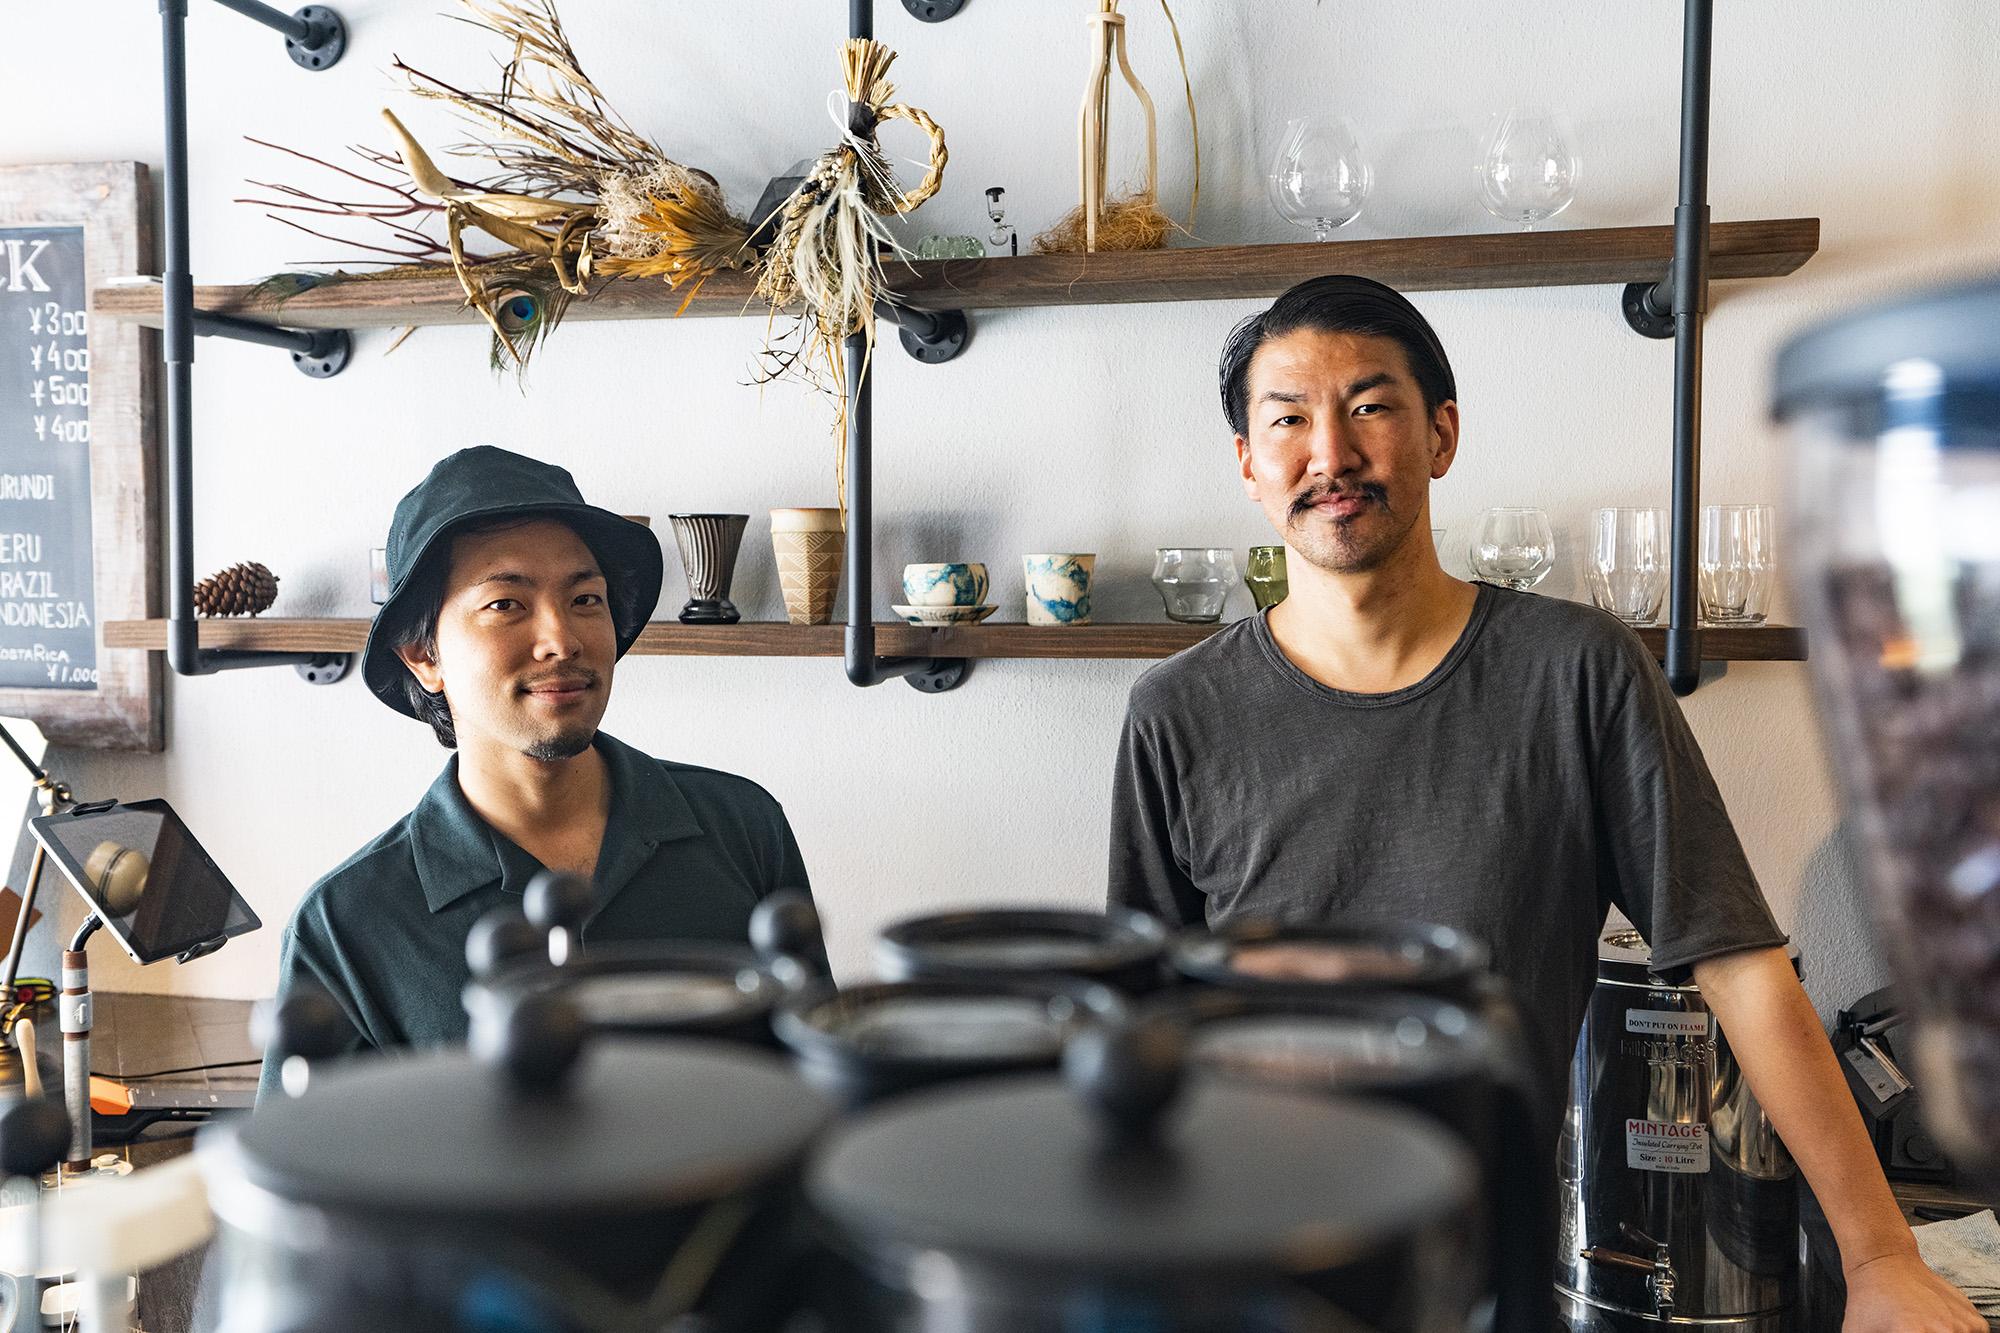 「rokkan COFFEE CREATORS」奥武拓也さん 石部宏幸さん / 那覇市桶川 与儀市場通り